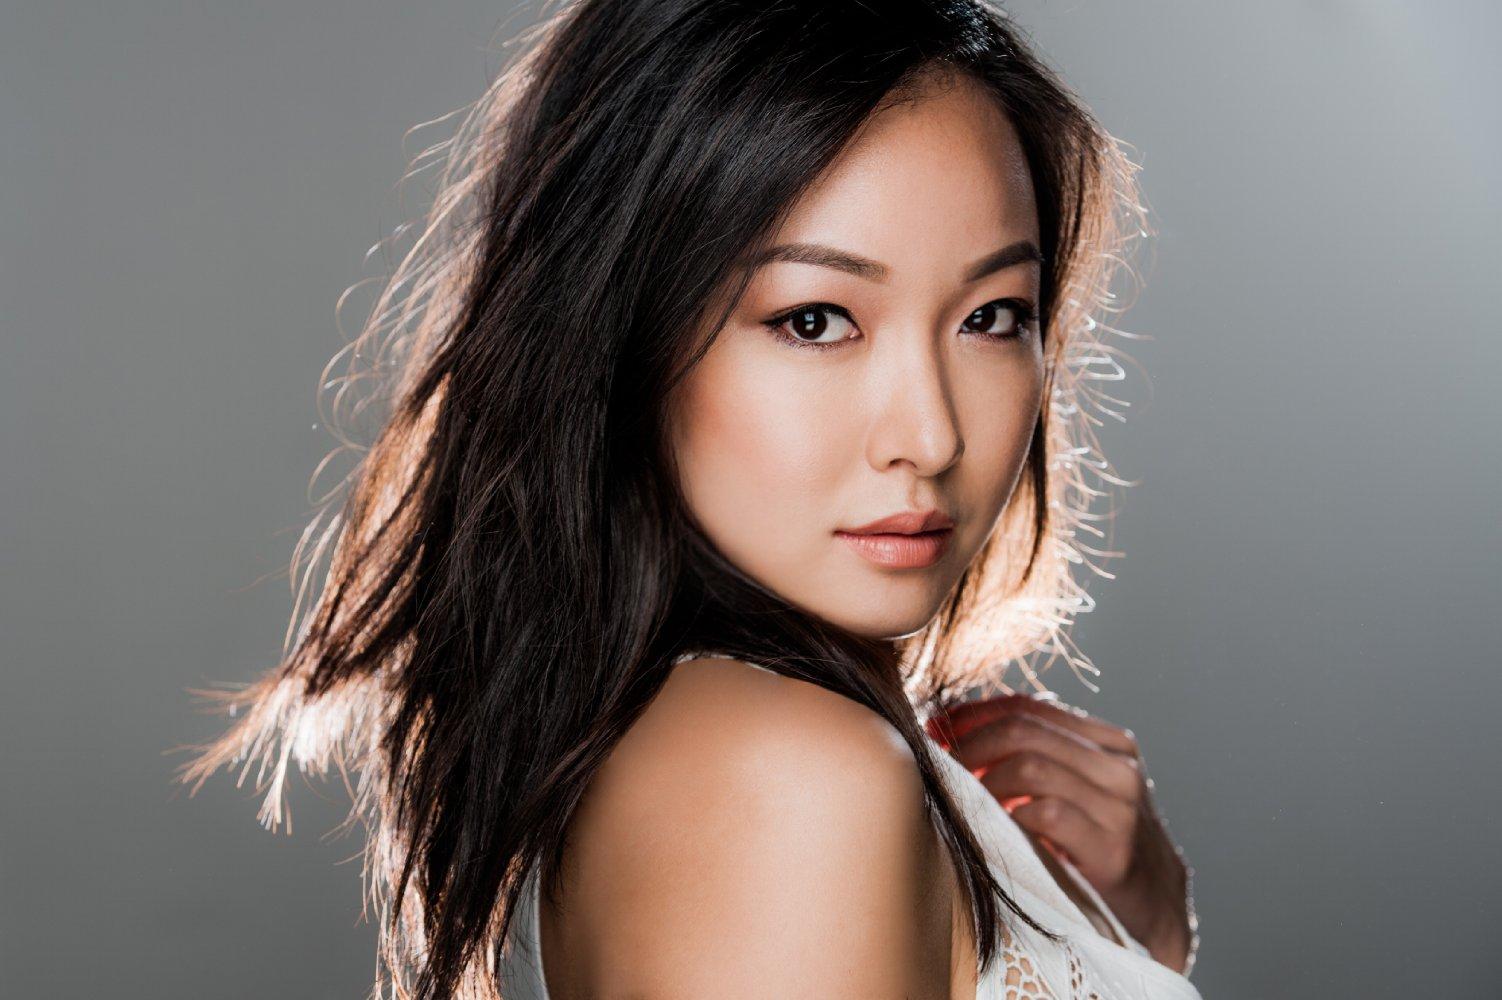 Charlet Chung